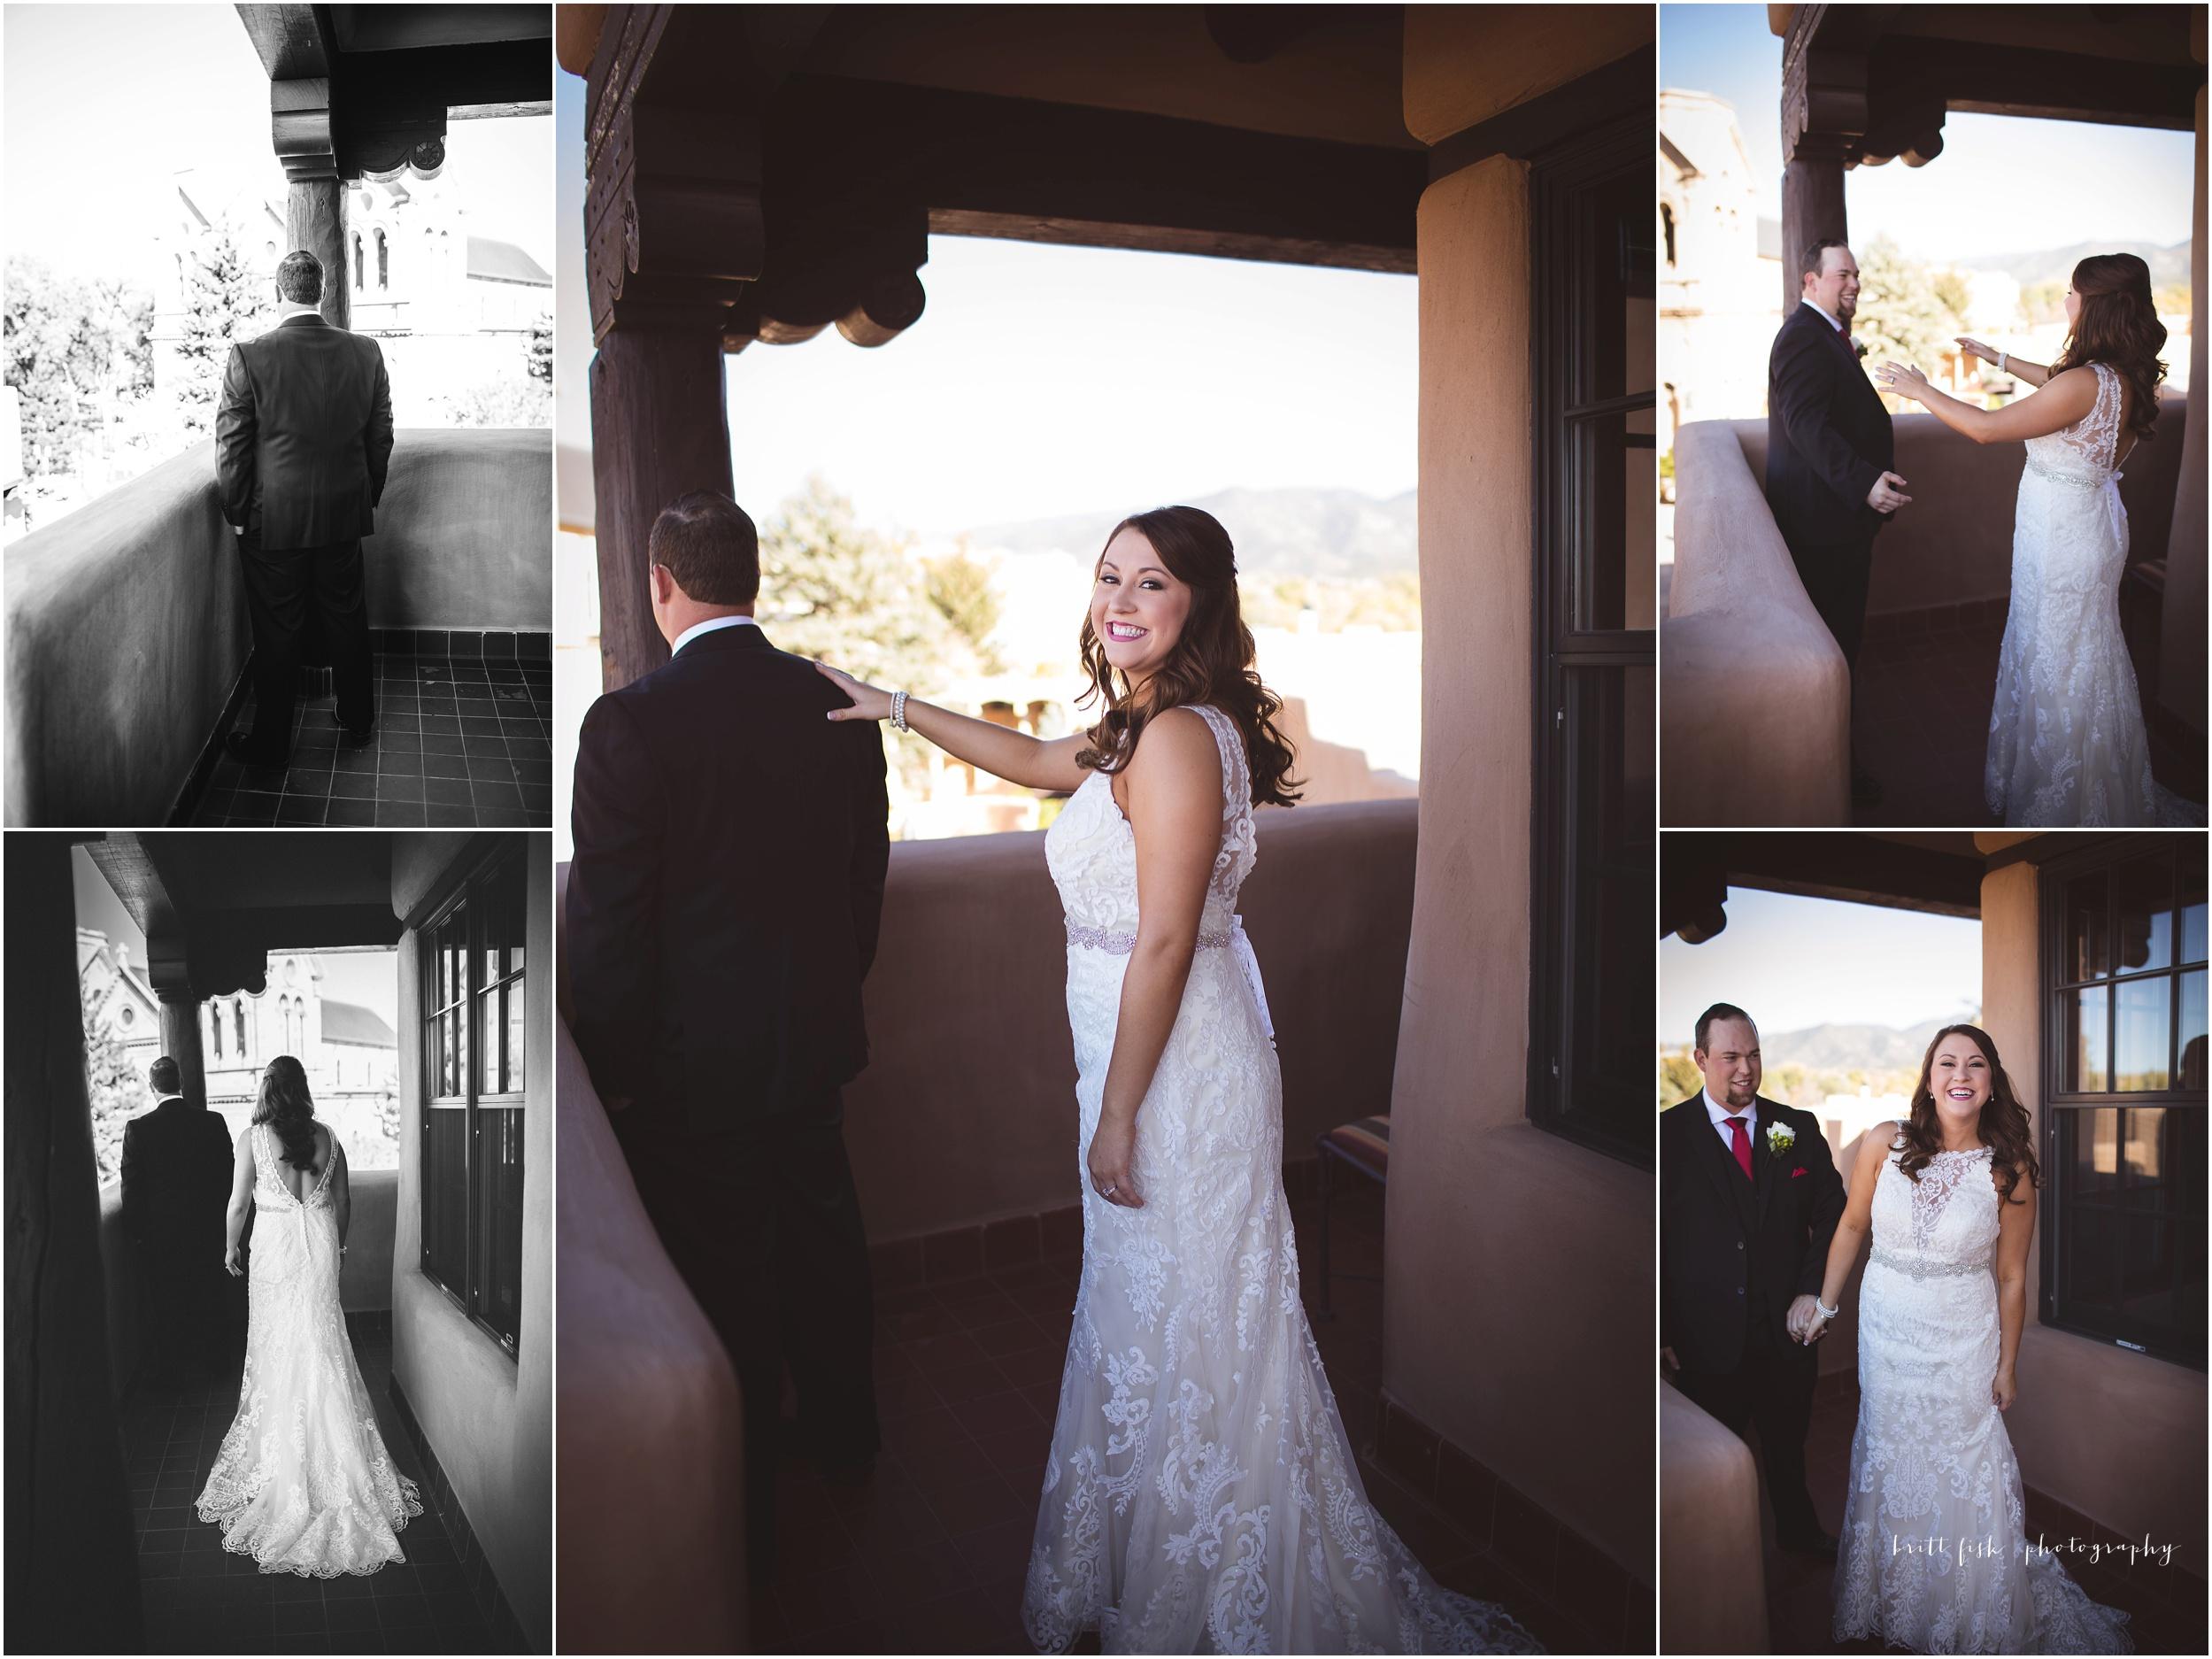 Wedding - Wood - Santa Fe, NM_0014.jpg